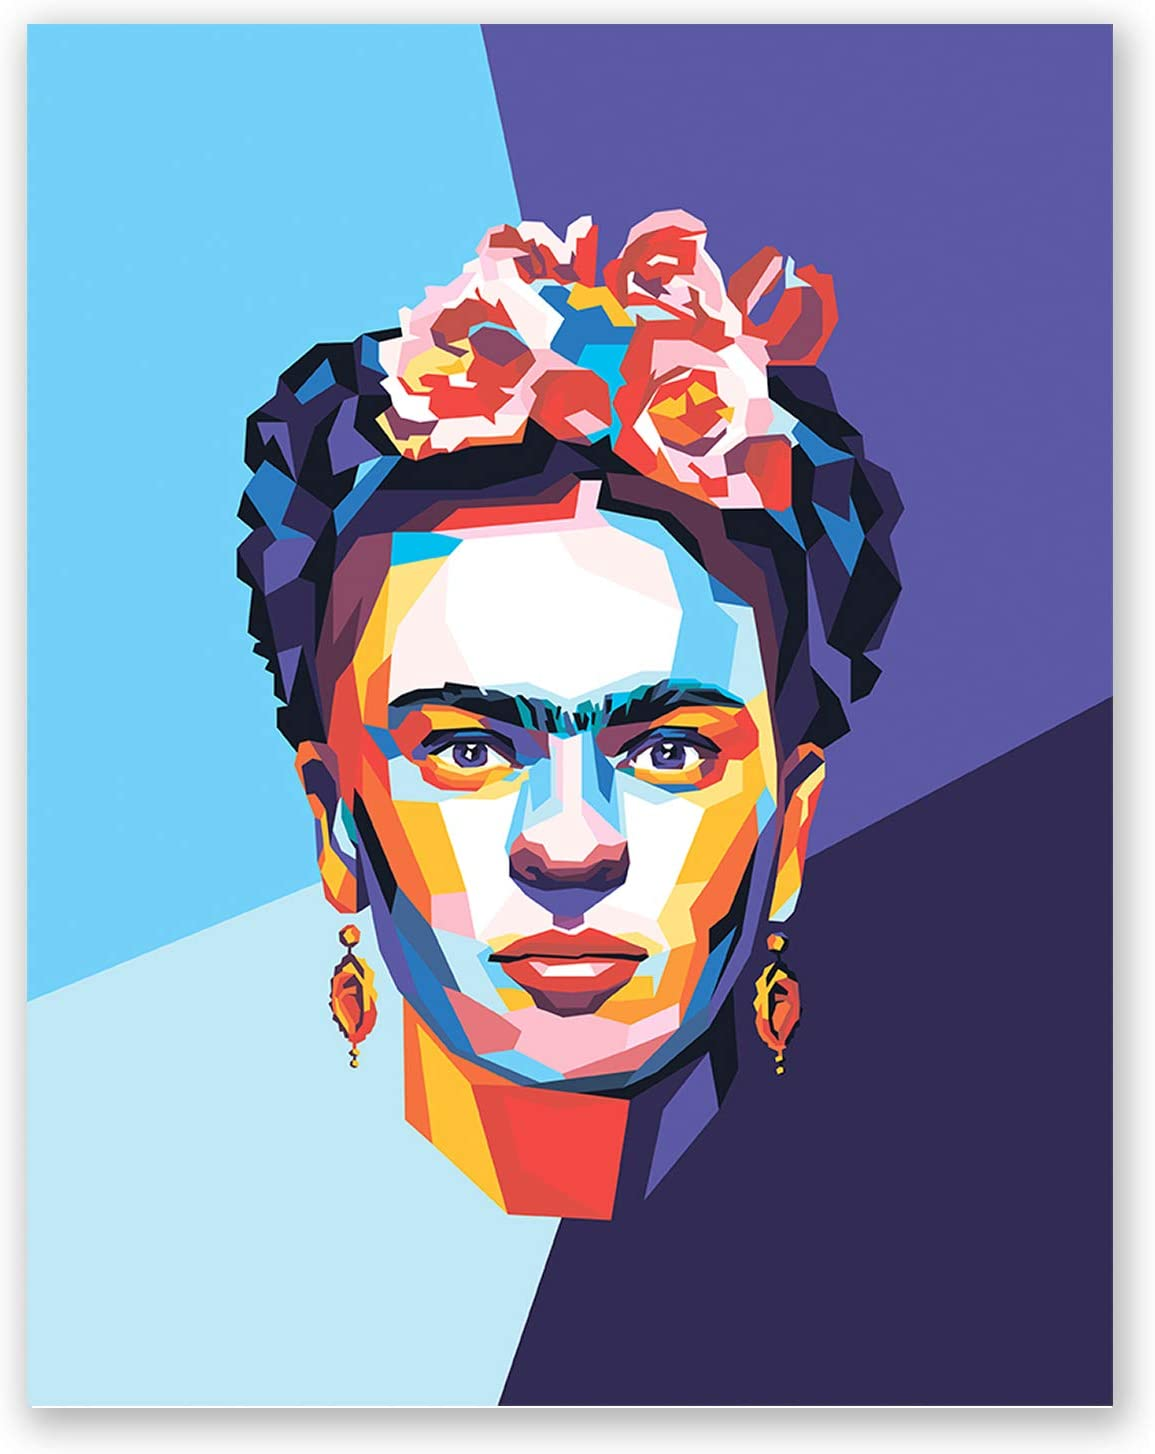 Frida Kahlo Poster – Inspirational Pop Art Portrait – Feminist Mexican Wall Home Decor – Iconic Artist (11x14)